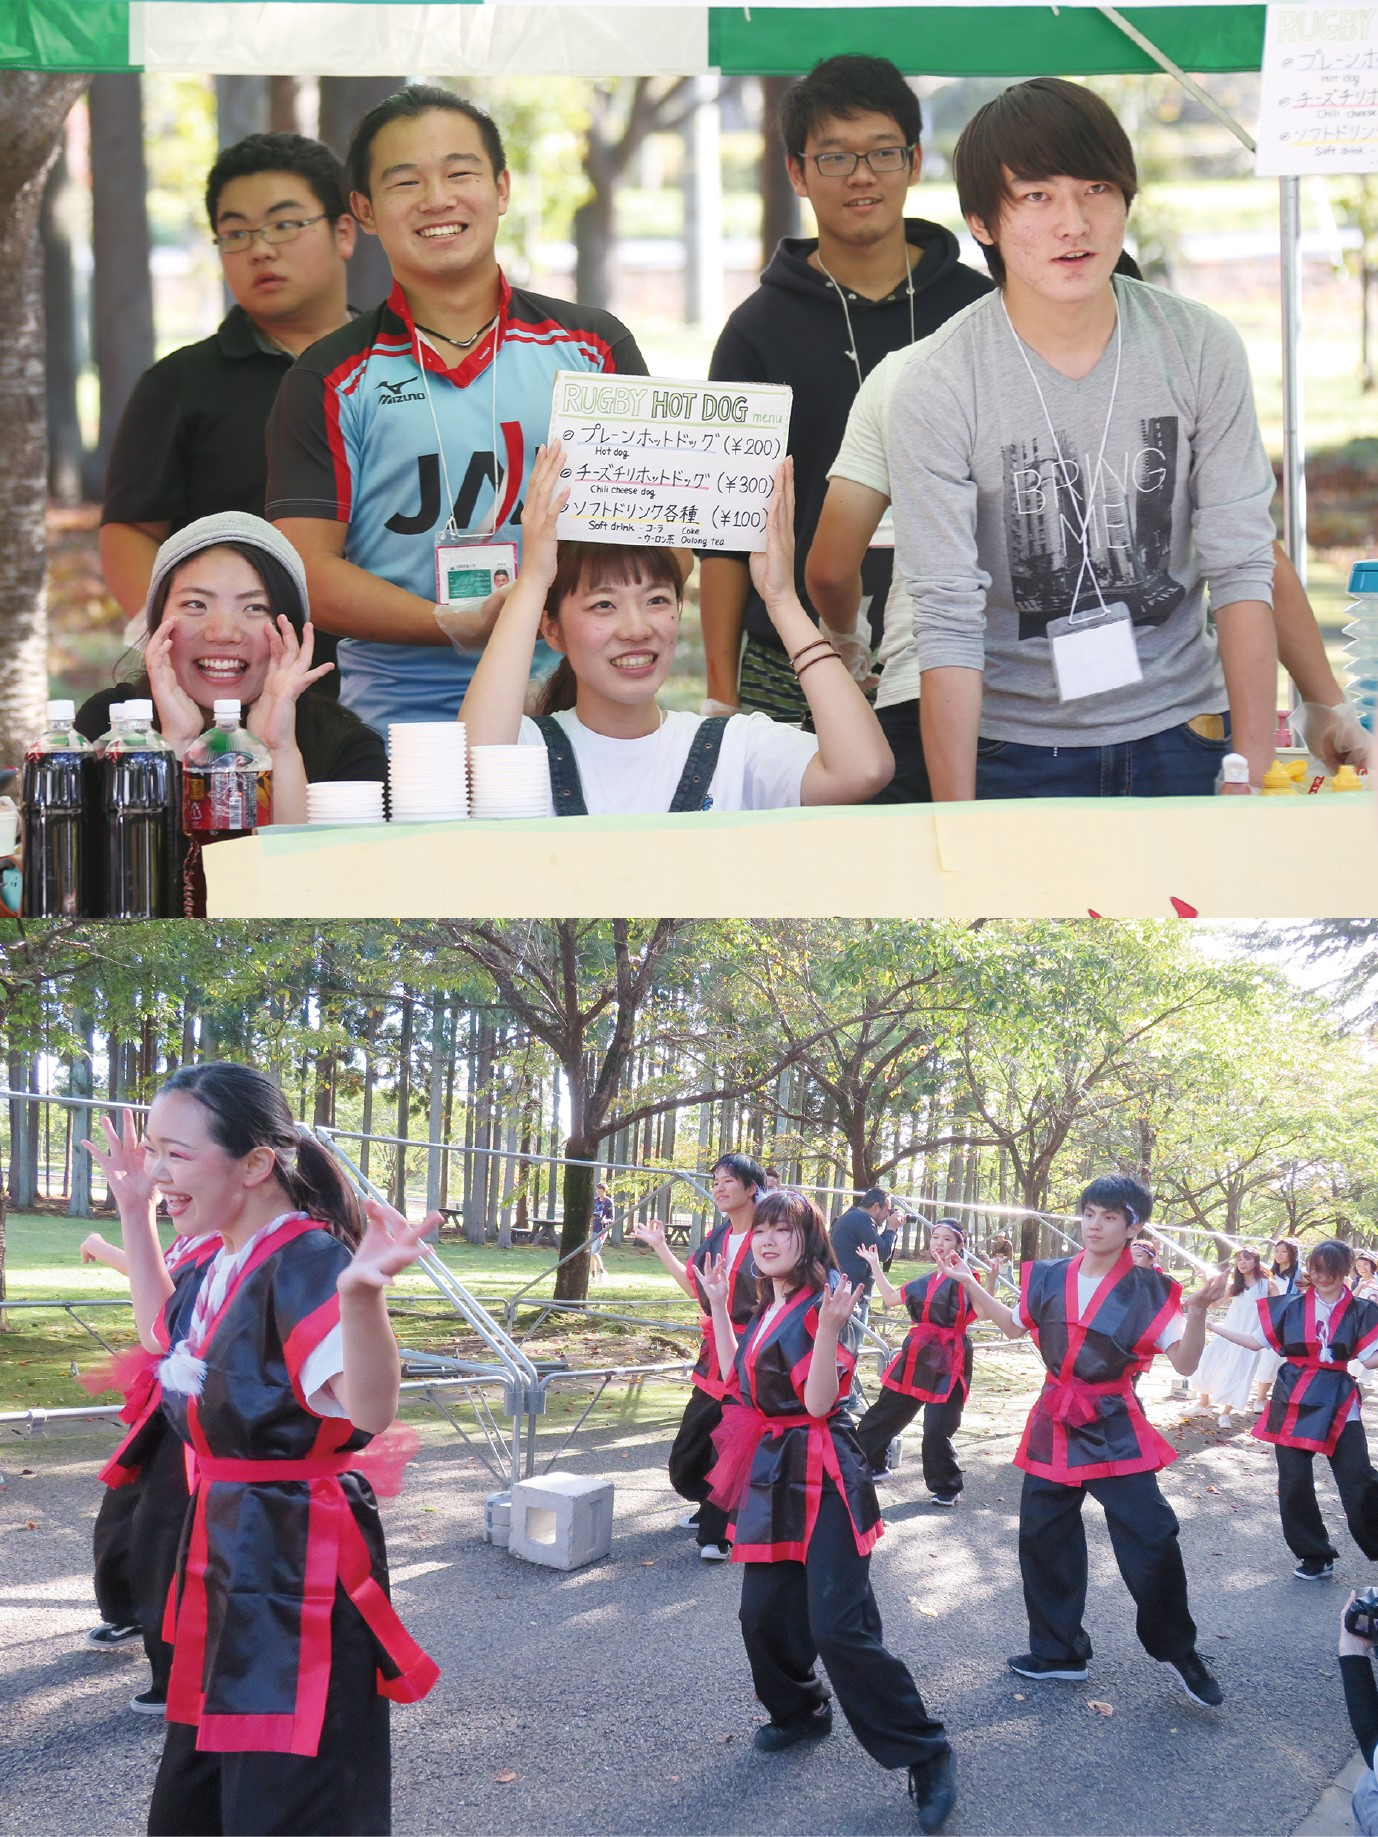 AIU祭でのヤートセチーム亜瑠団の写真